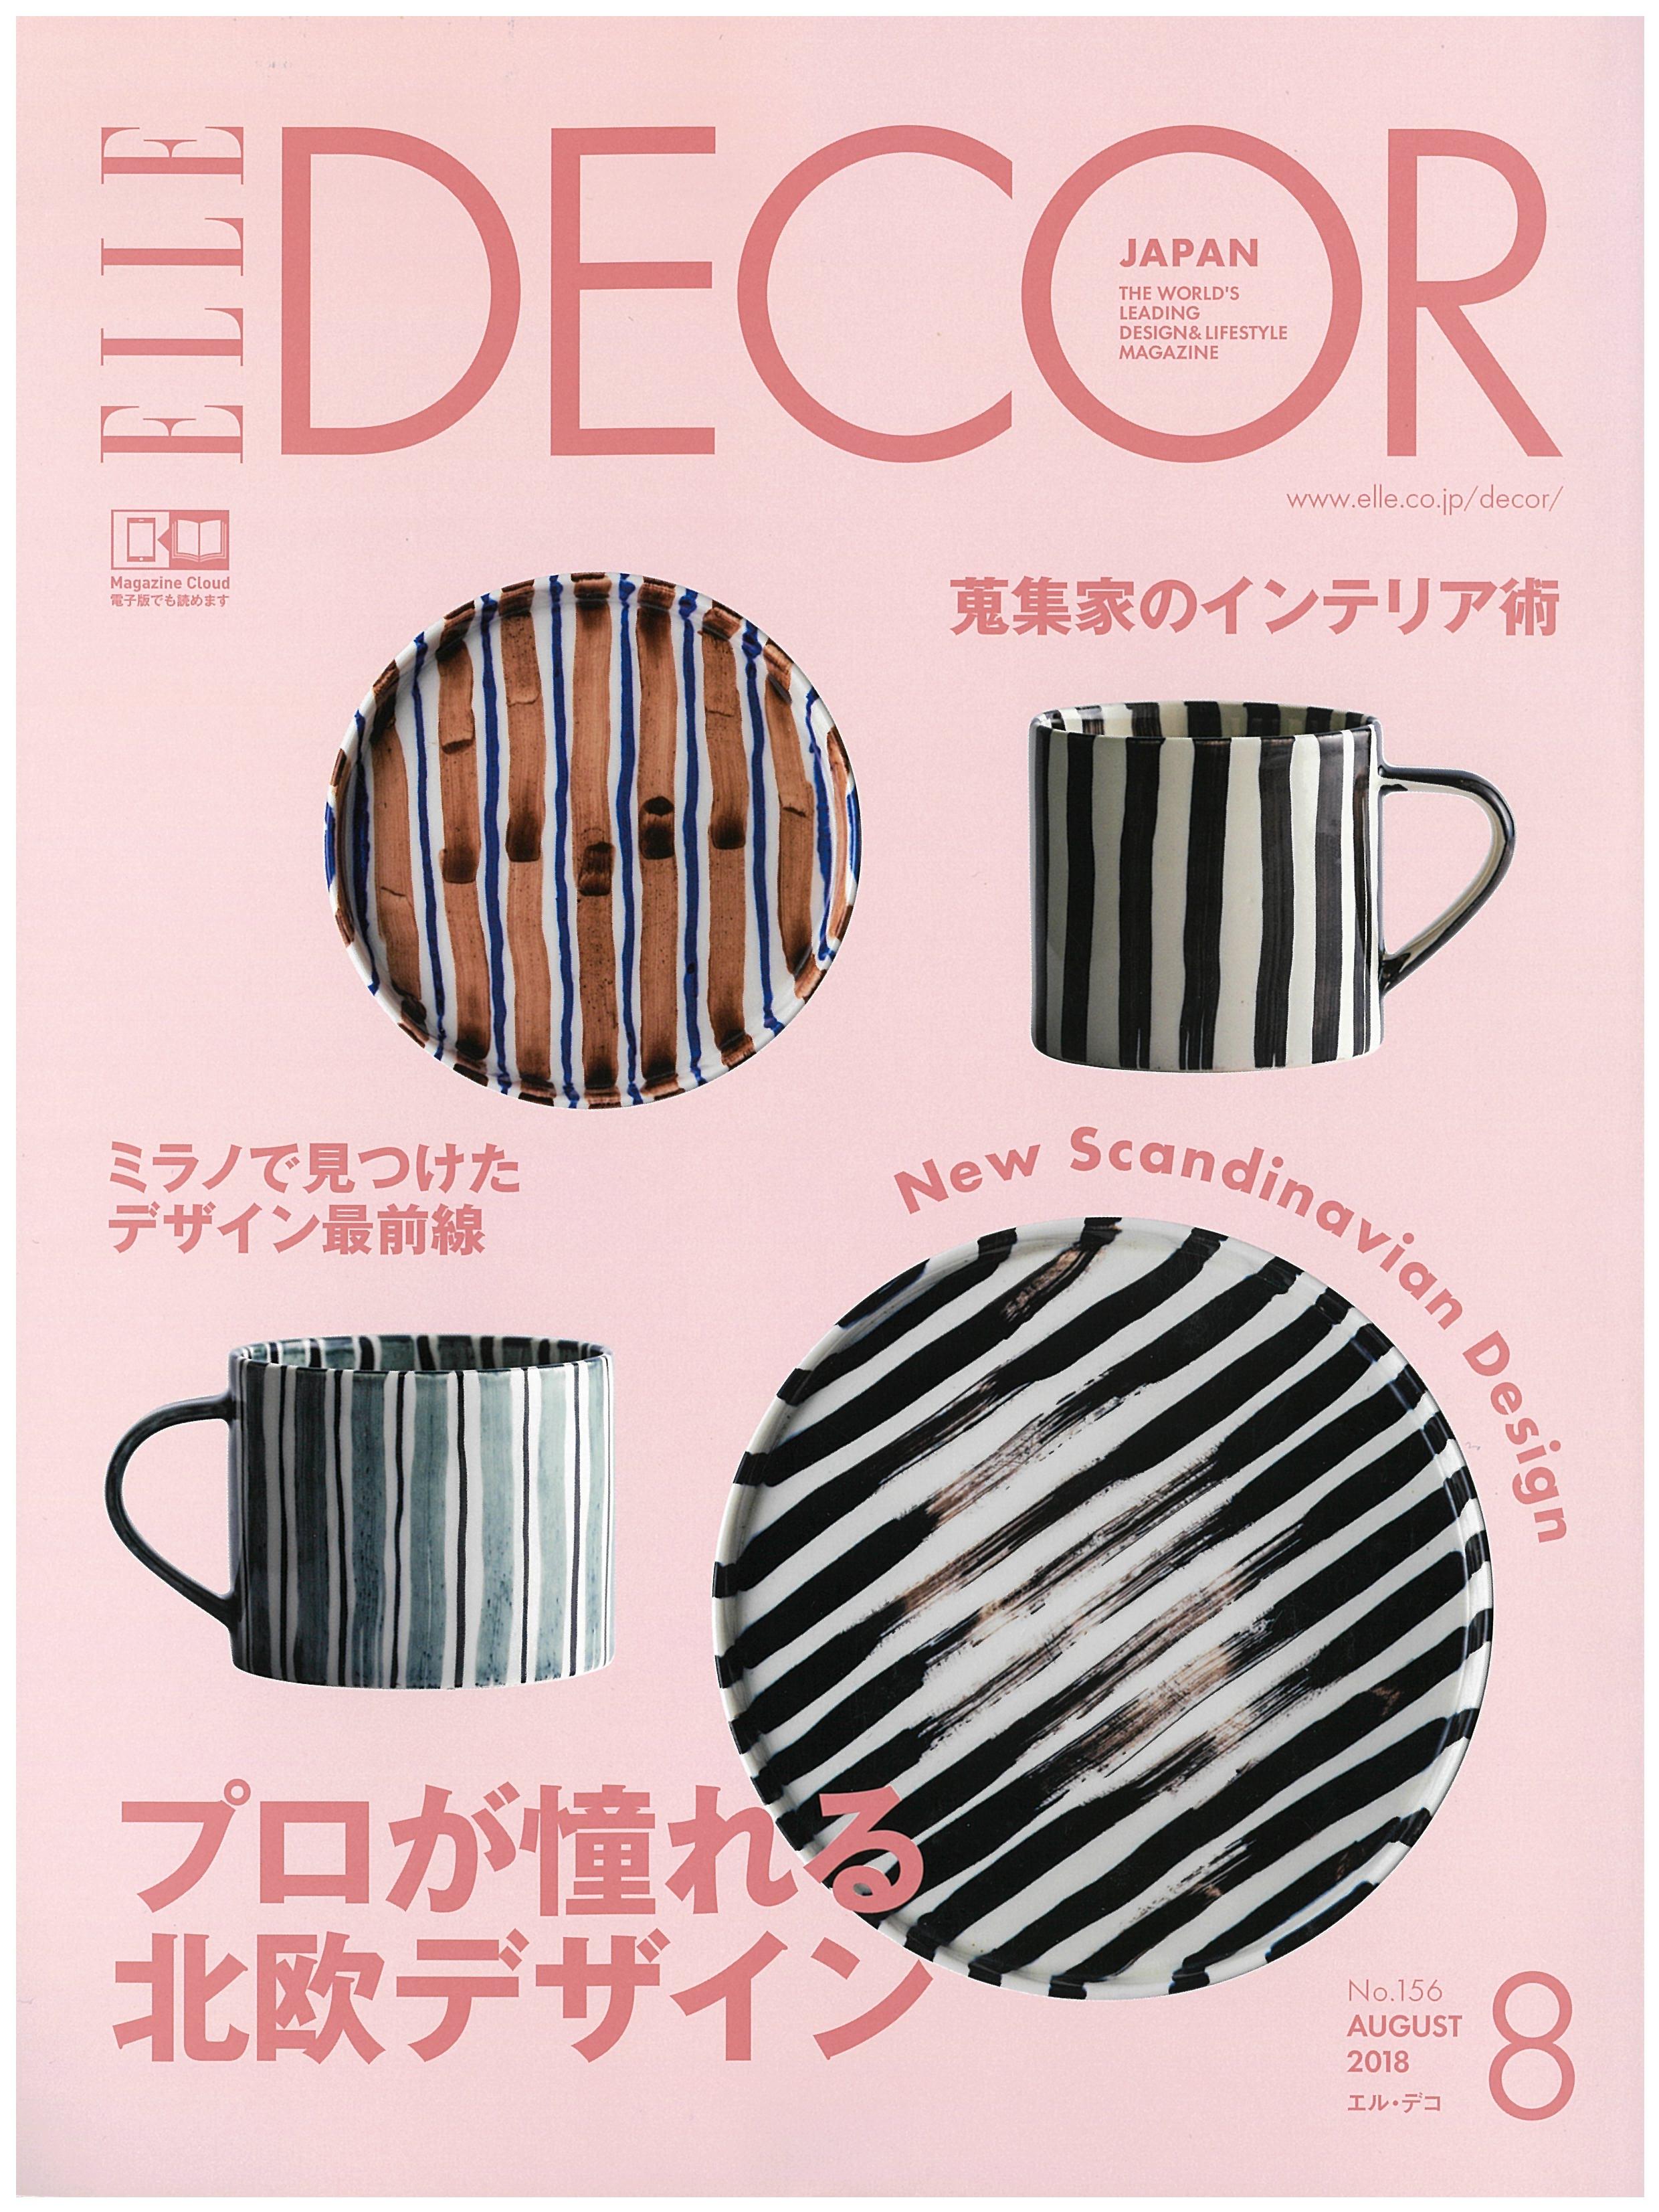 ELLE DECOR Japan_no.156_Aug. issue_Preludia series_Page_1.jpg